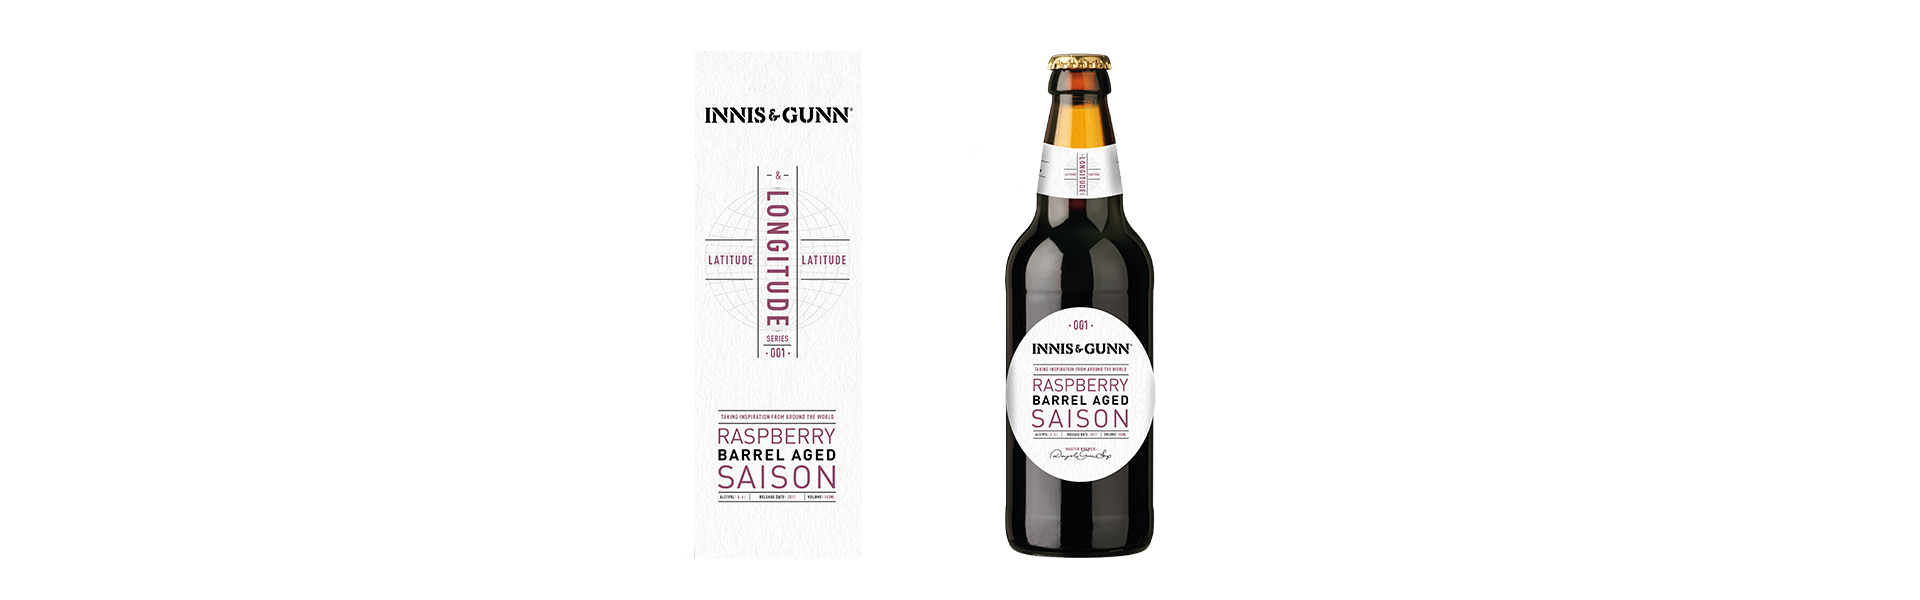 Innis & Gunn släpper ekfatslagrad saison med smak av hallon.